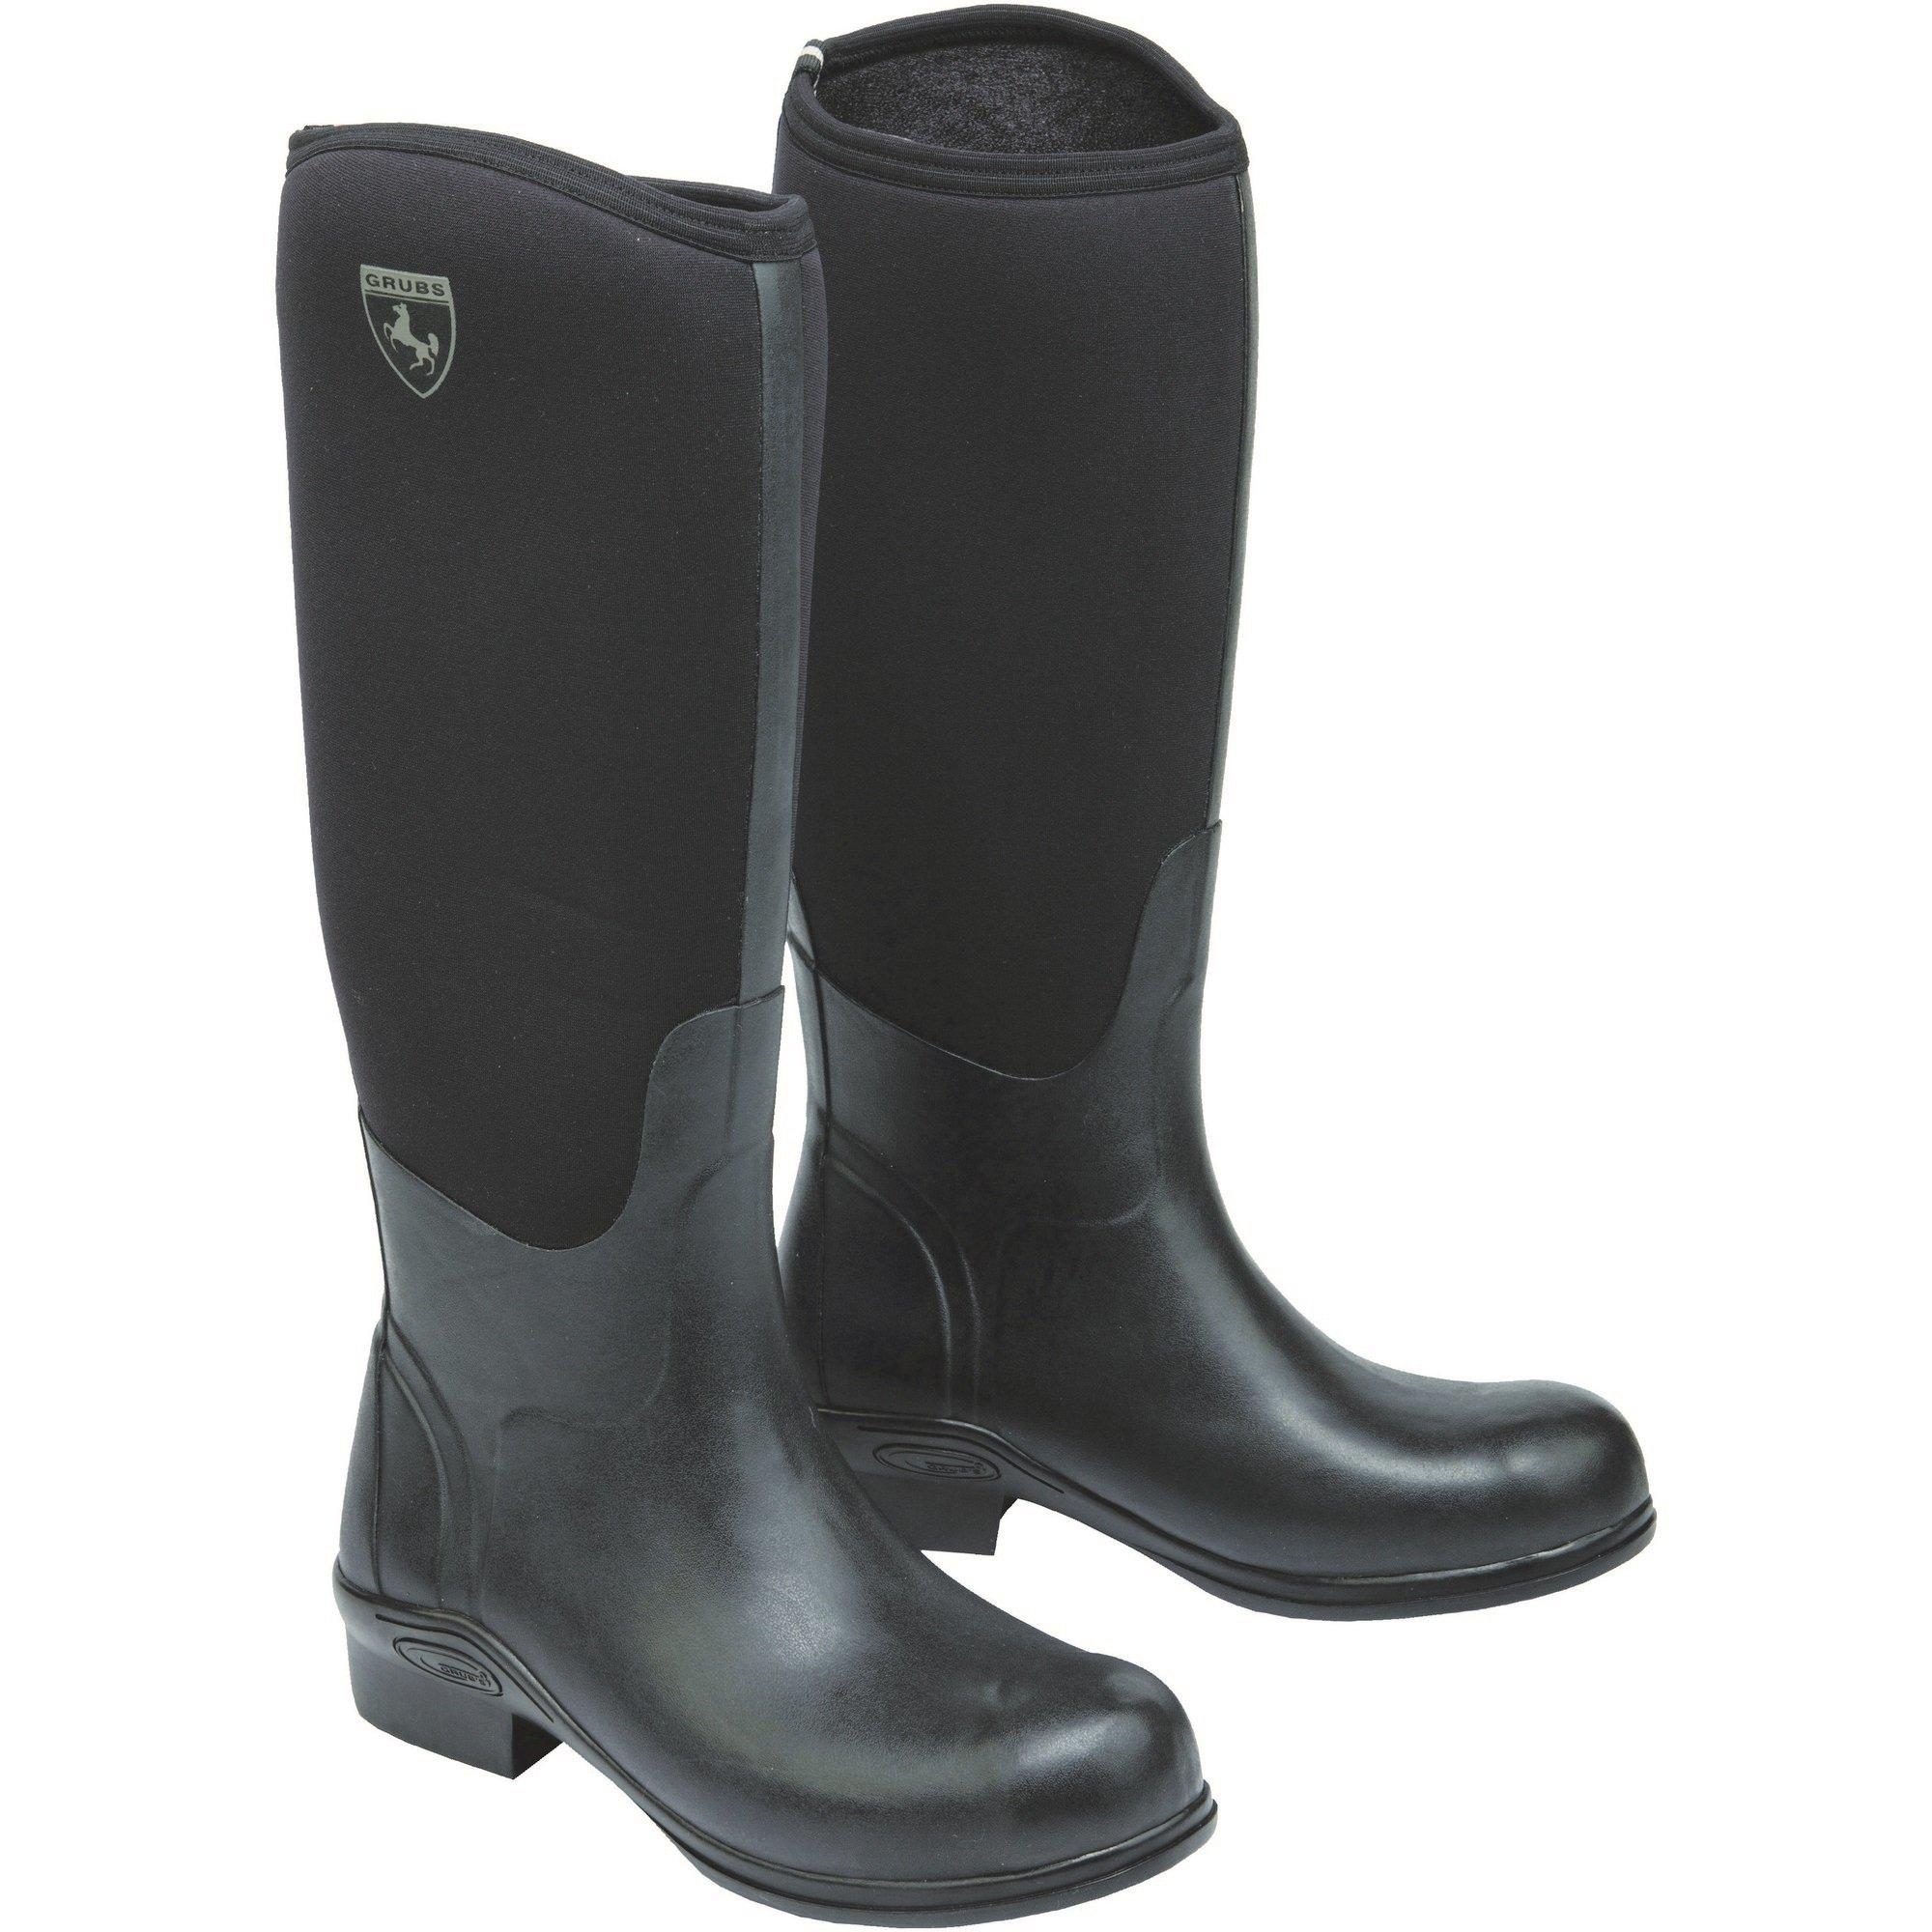 Grubs Womens/Ladies Rideline Riding Boots (6 US) (Black)